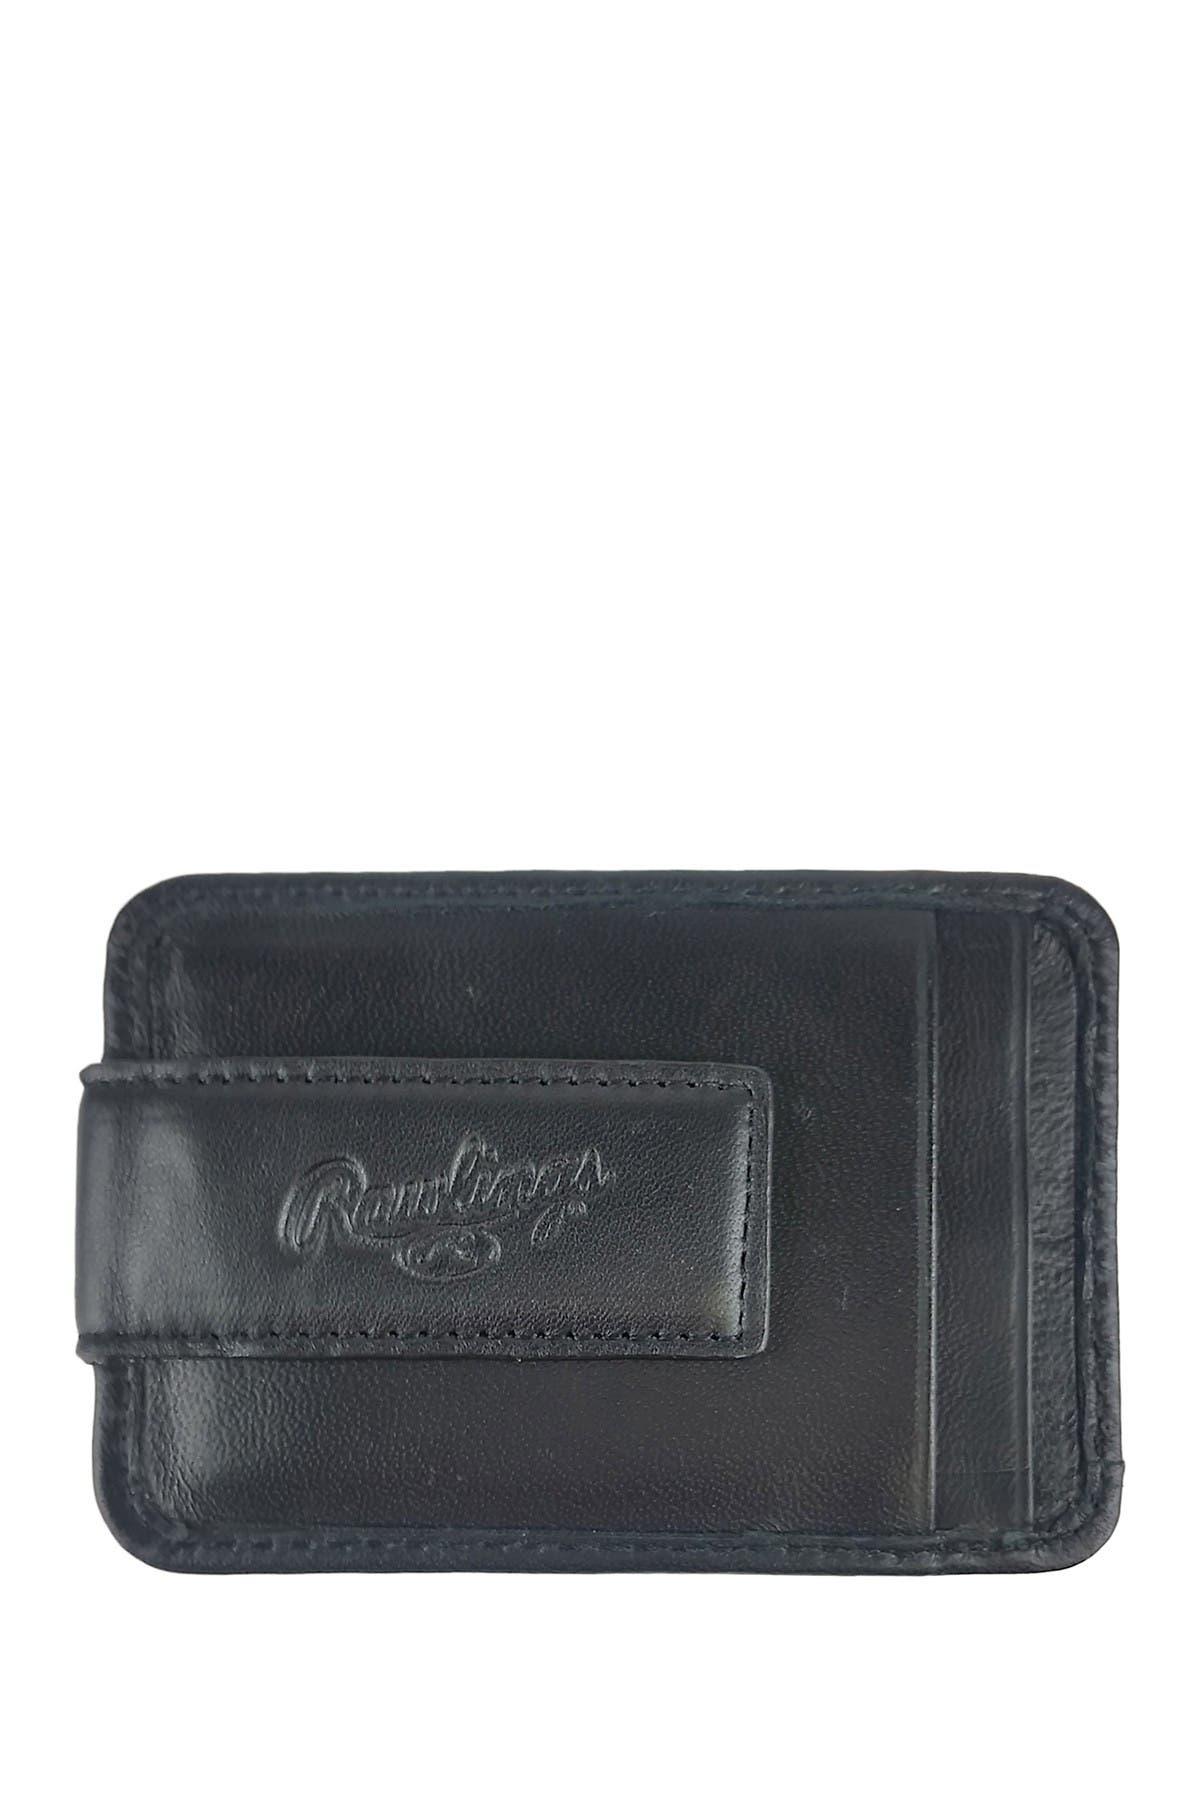 Image of Rawlings Baseball Stitch Money Clip Wallet